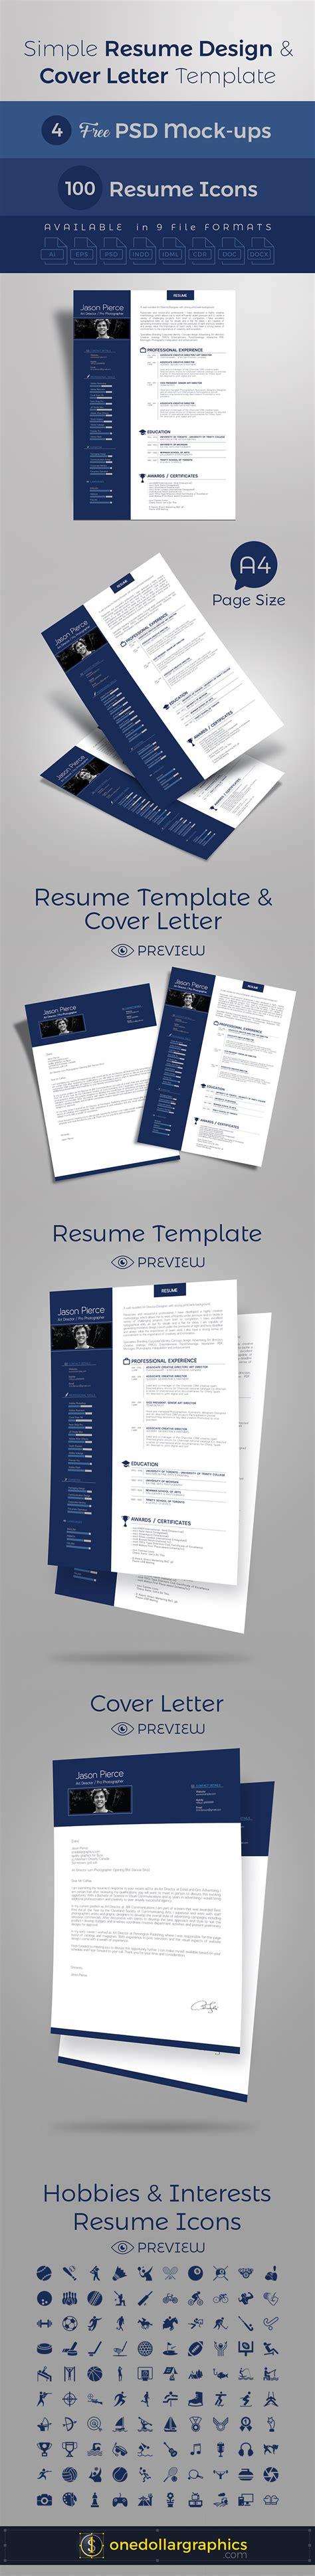 simple resume template psd simple resume cv design cover letter template 4 psd